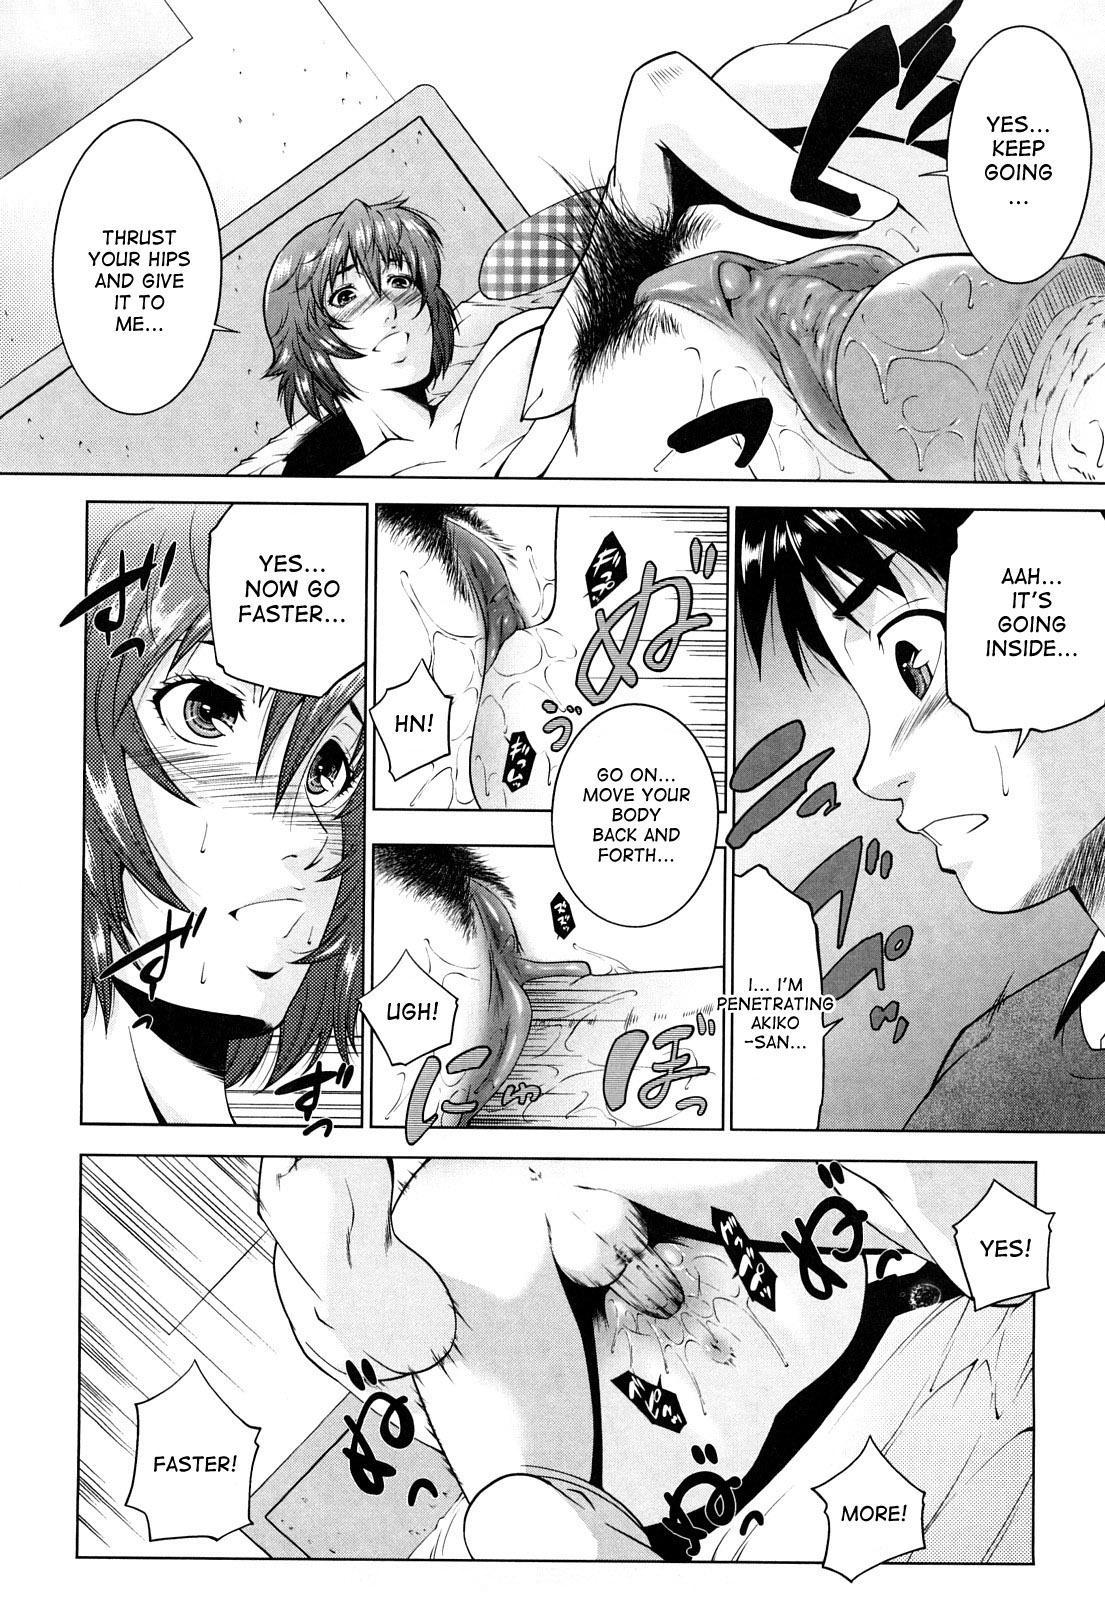 [Touma Itsuki] Ane-sama Inkou - Sister's Sexy Smell Ch. 1-6 [English] [desudesu] [Decensored] 31